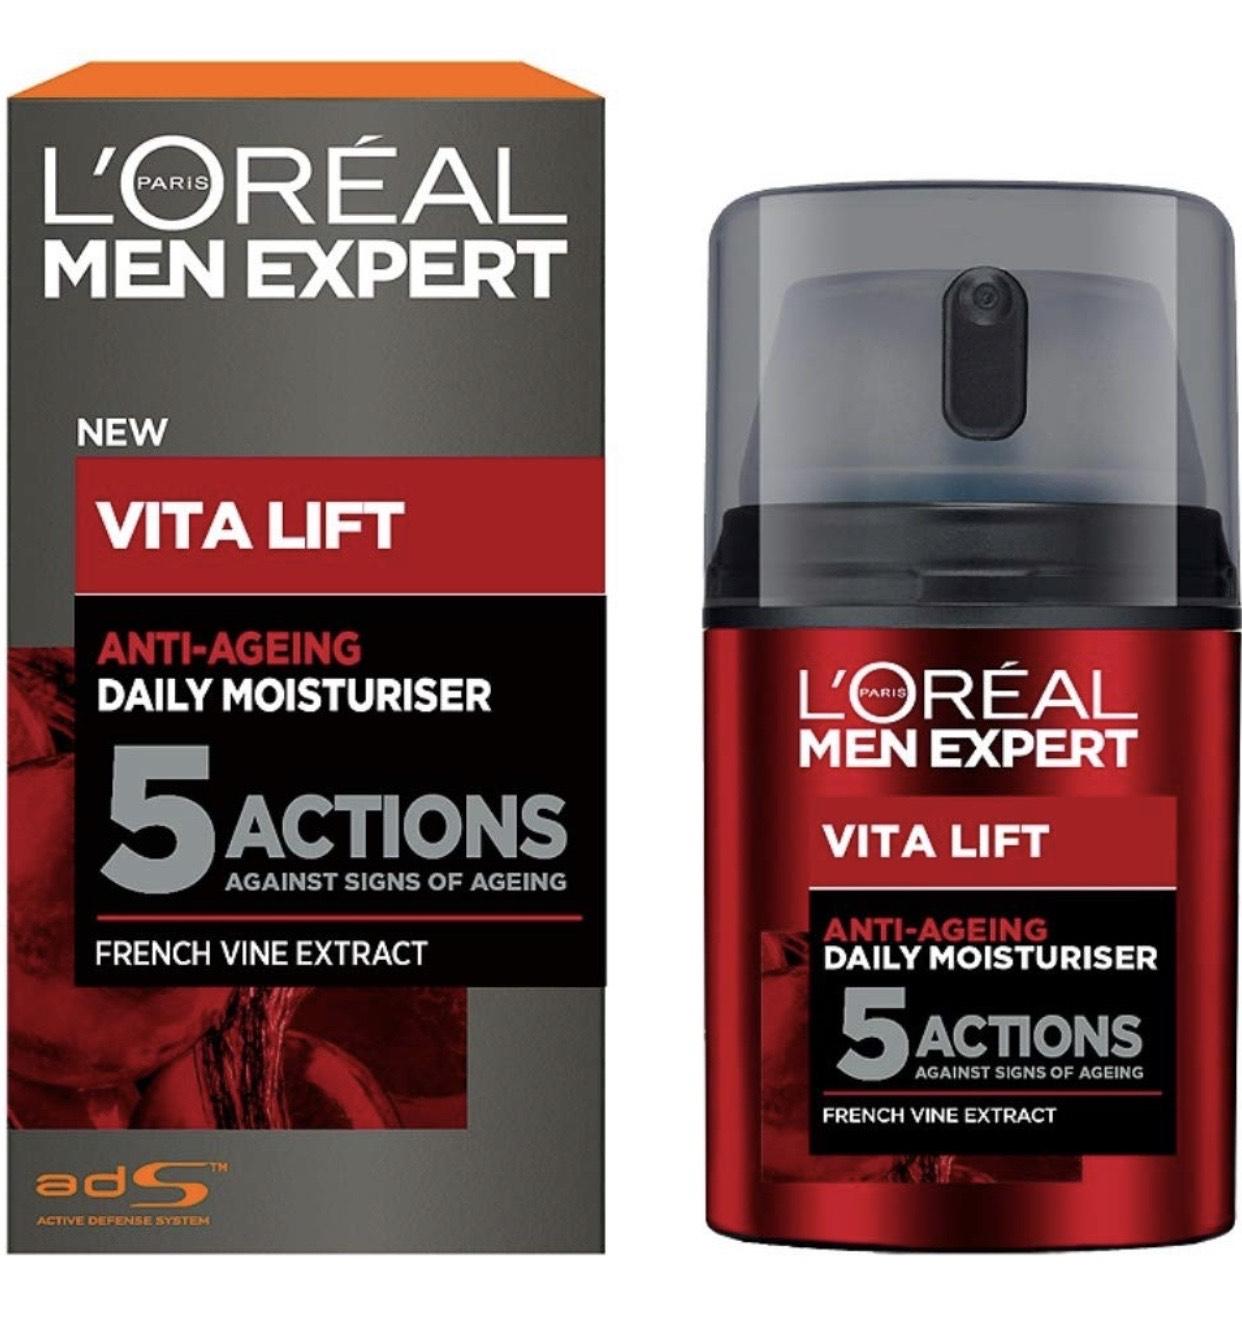 L'Oréal Paris Men Expert Vita Lift 5 Anti Ageing Moisturiser 50 ml - £7.56 / £5.67 with Subscribe & Save Prime / +£4.49 non Prime @ Amazon